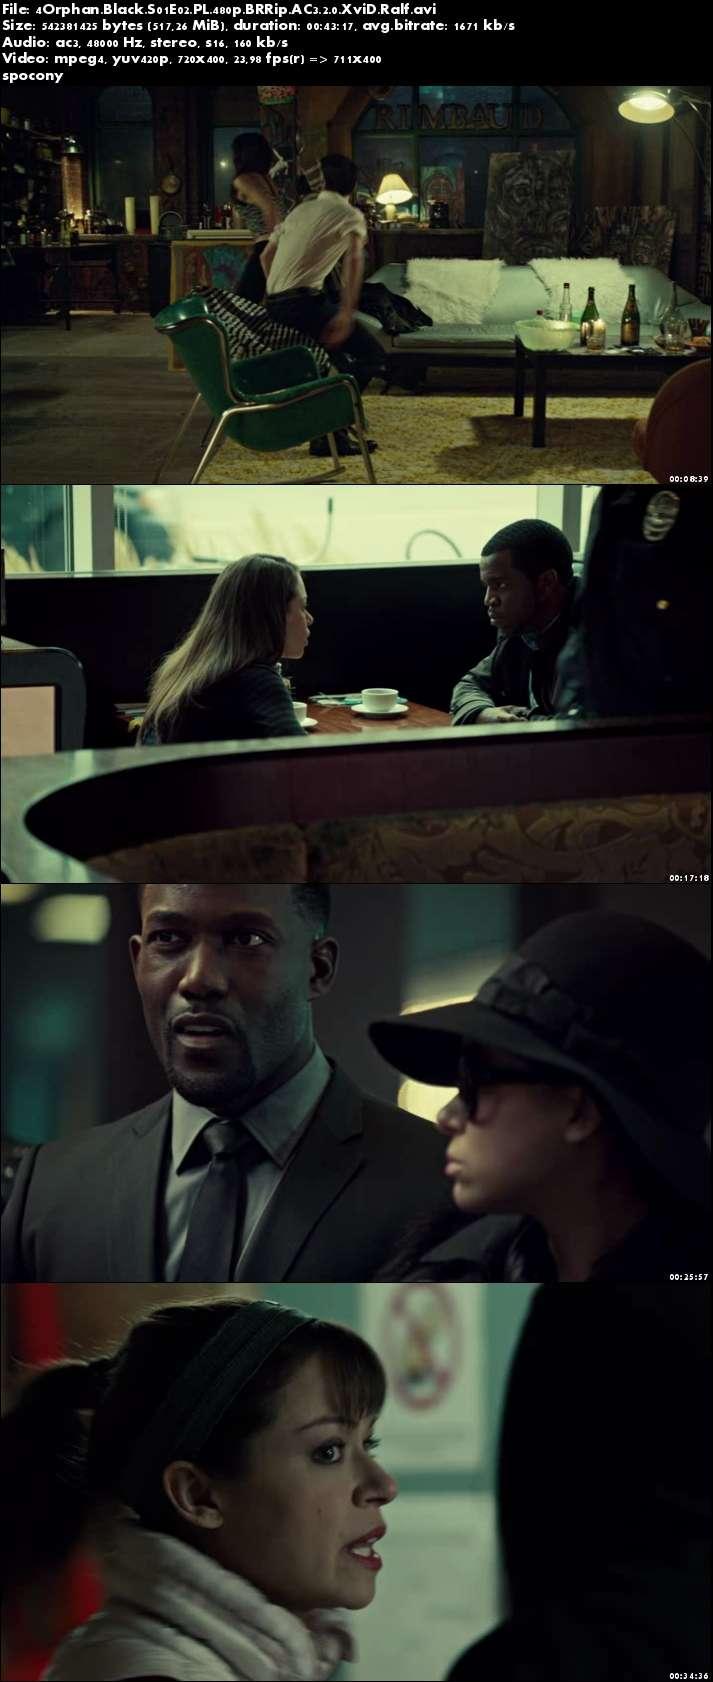 Orphan Black (2013) {Sezon 1} (Pełen sezon) PL.480p.BRRip.AC3.2.0.XviD.Ralf [Lektor PL]